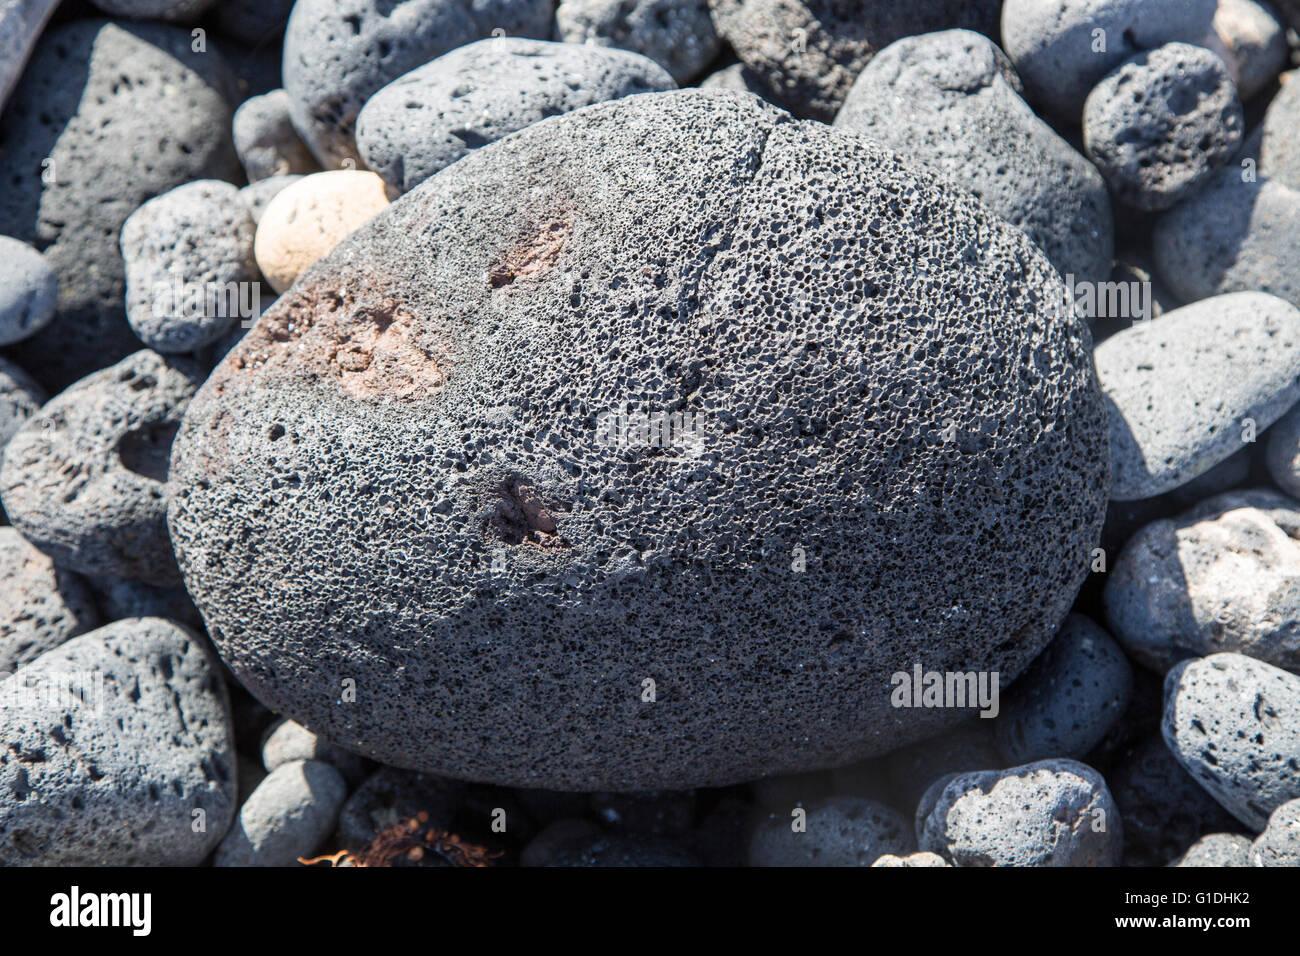 Large pumice stone rounded beach pebbles, Caleta de Caballo, Lanzarote, Canary islands, Spain - Stock Image